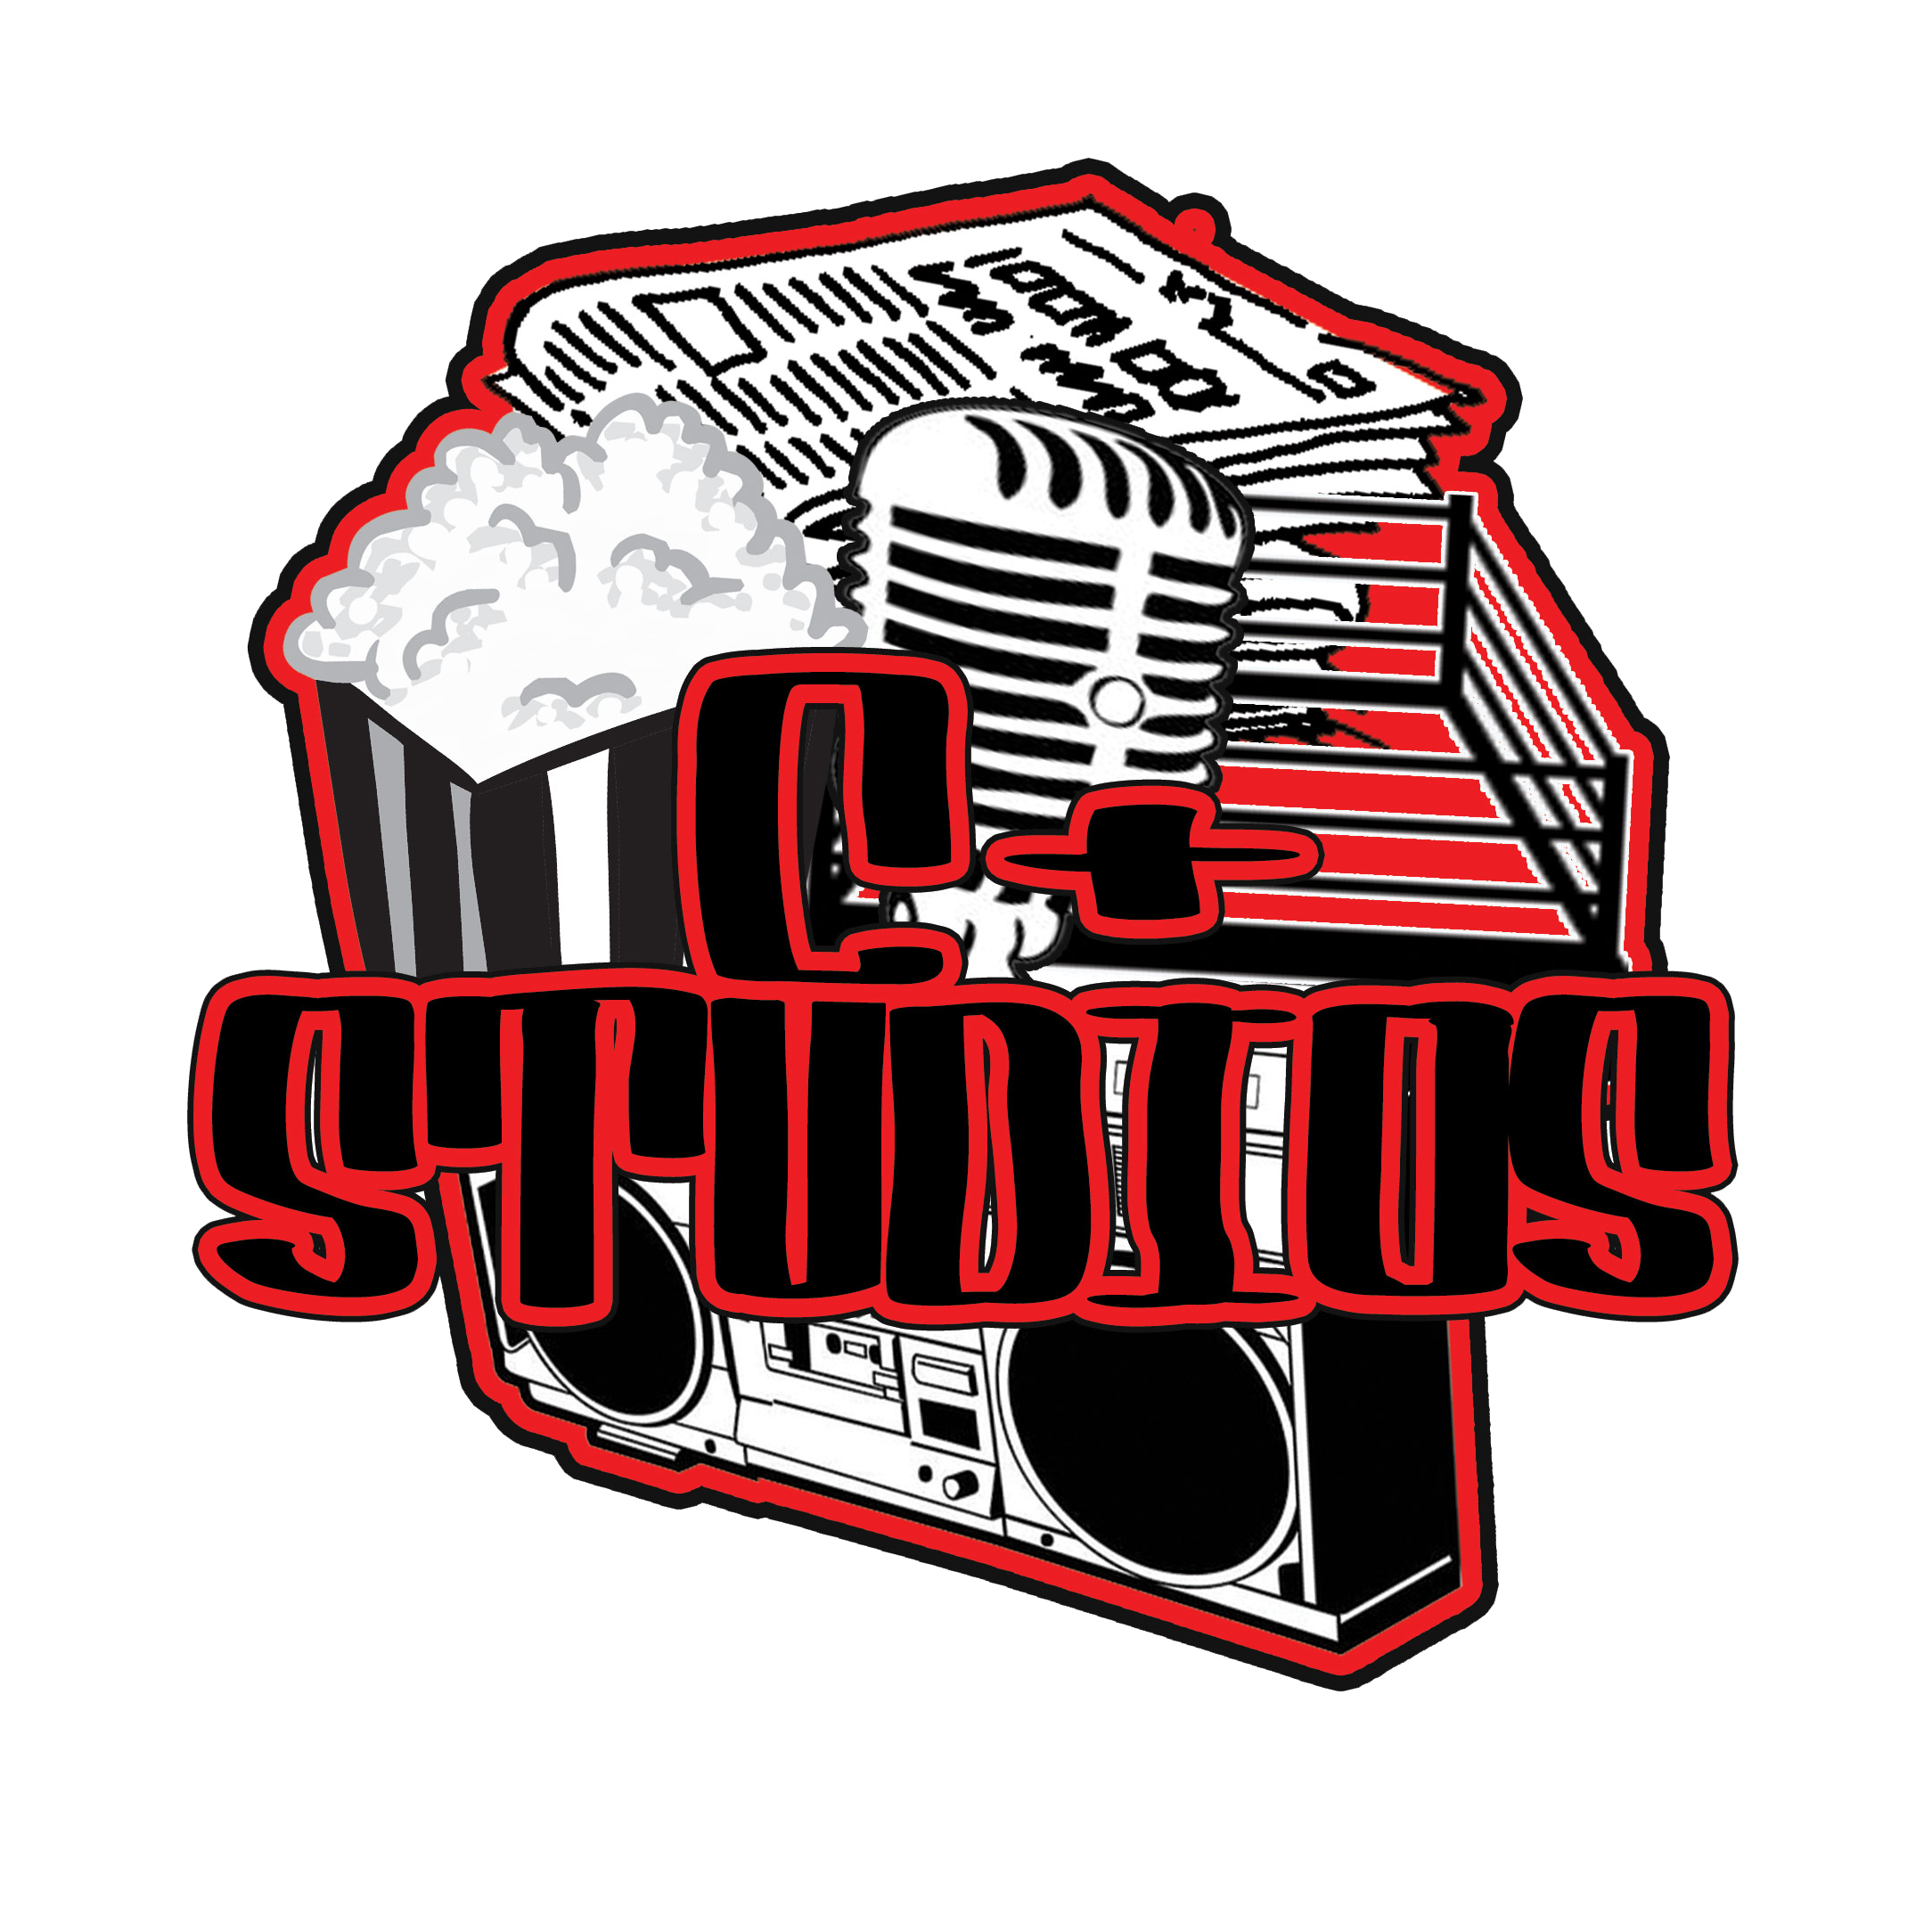 C+ Studios (Cplusstudios928) Profile Image | Linktree